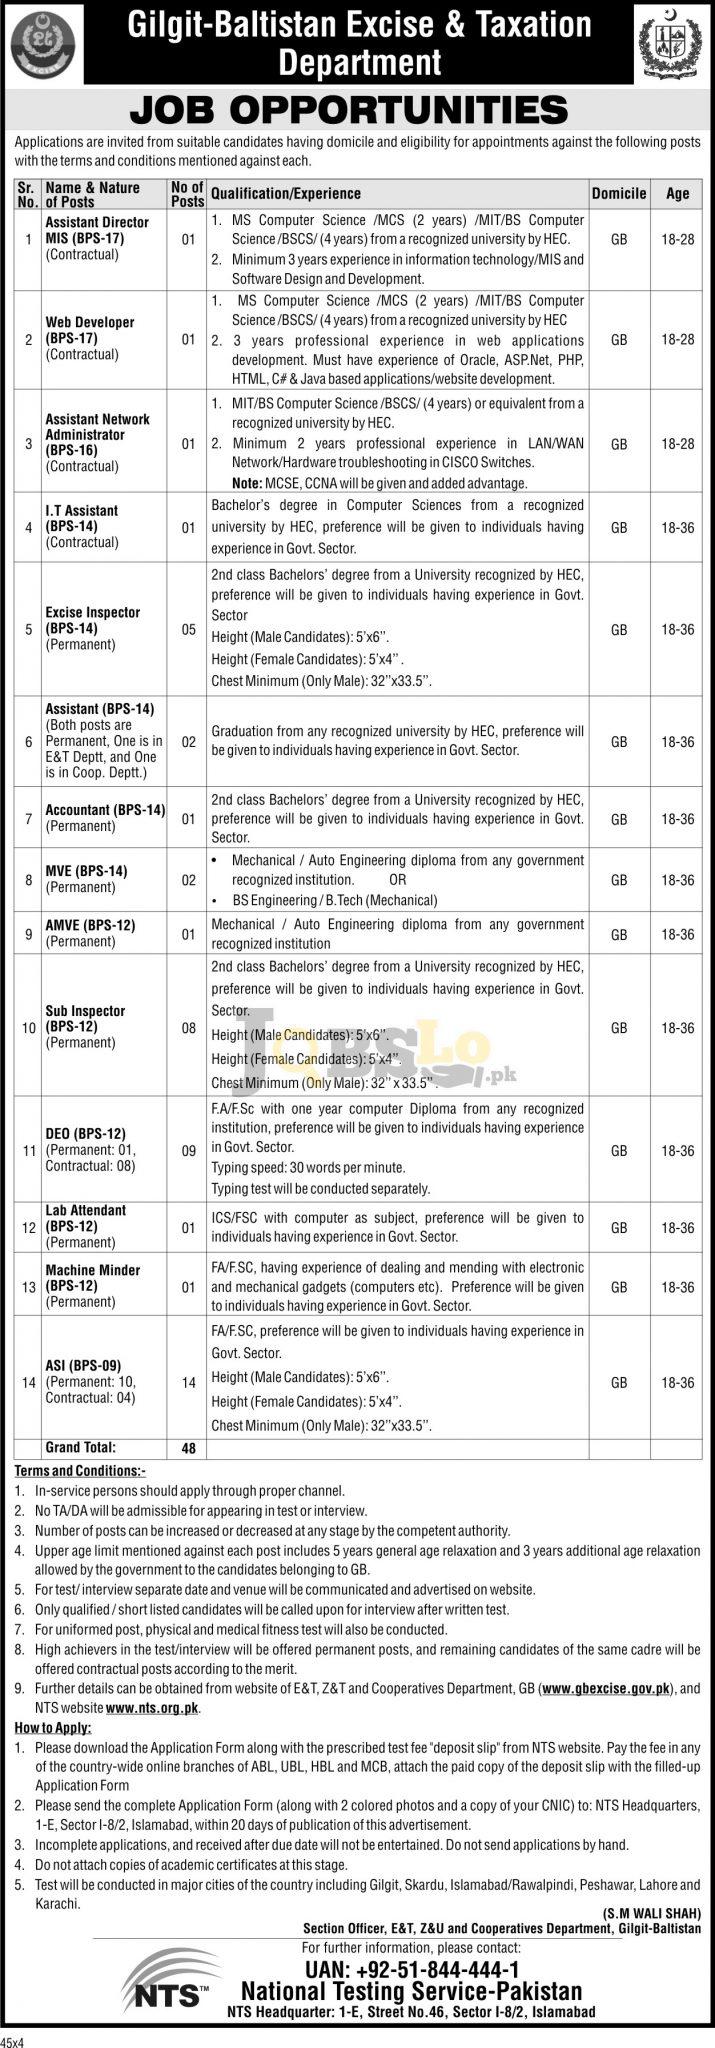 Excise & Taxation Department Gilgit Baltistan Jobs 2016 NTS Online Form Download